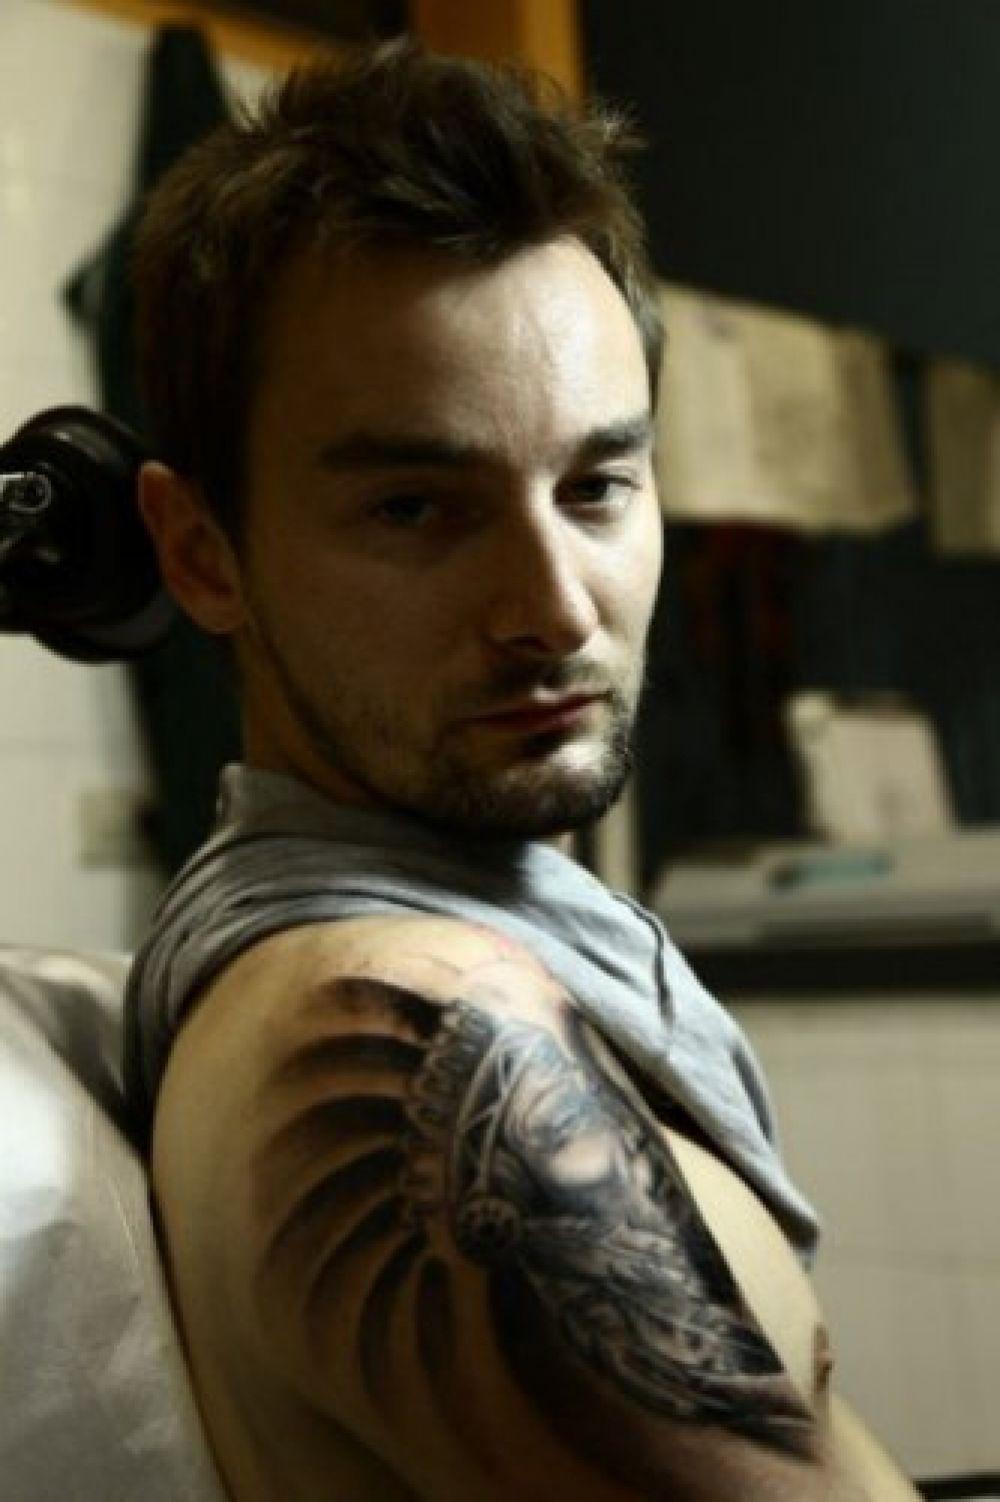 Алан Бадоев – украинский режиссер и клипмейкер, 33 года